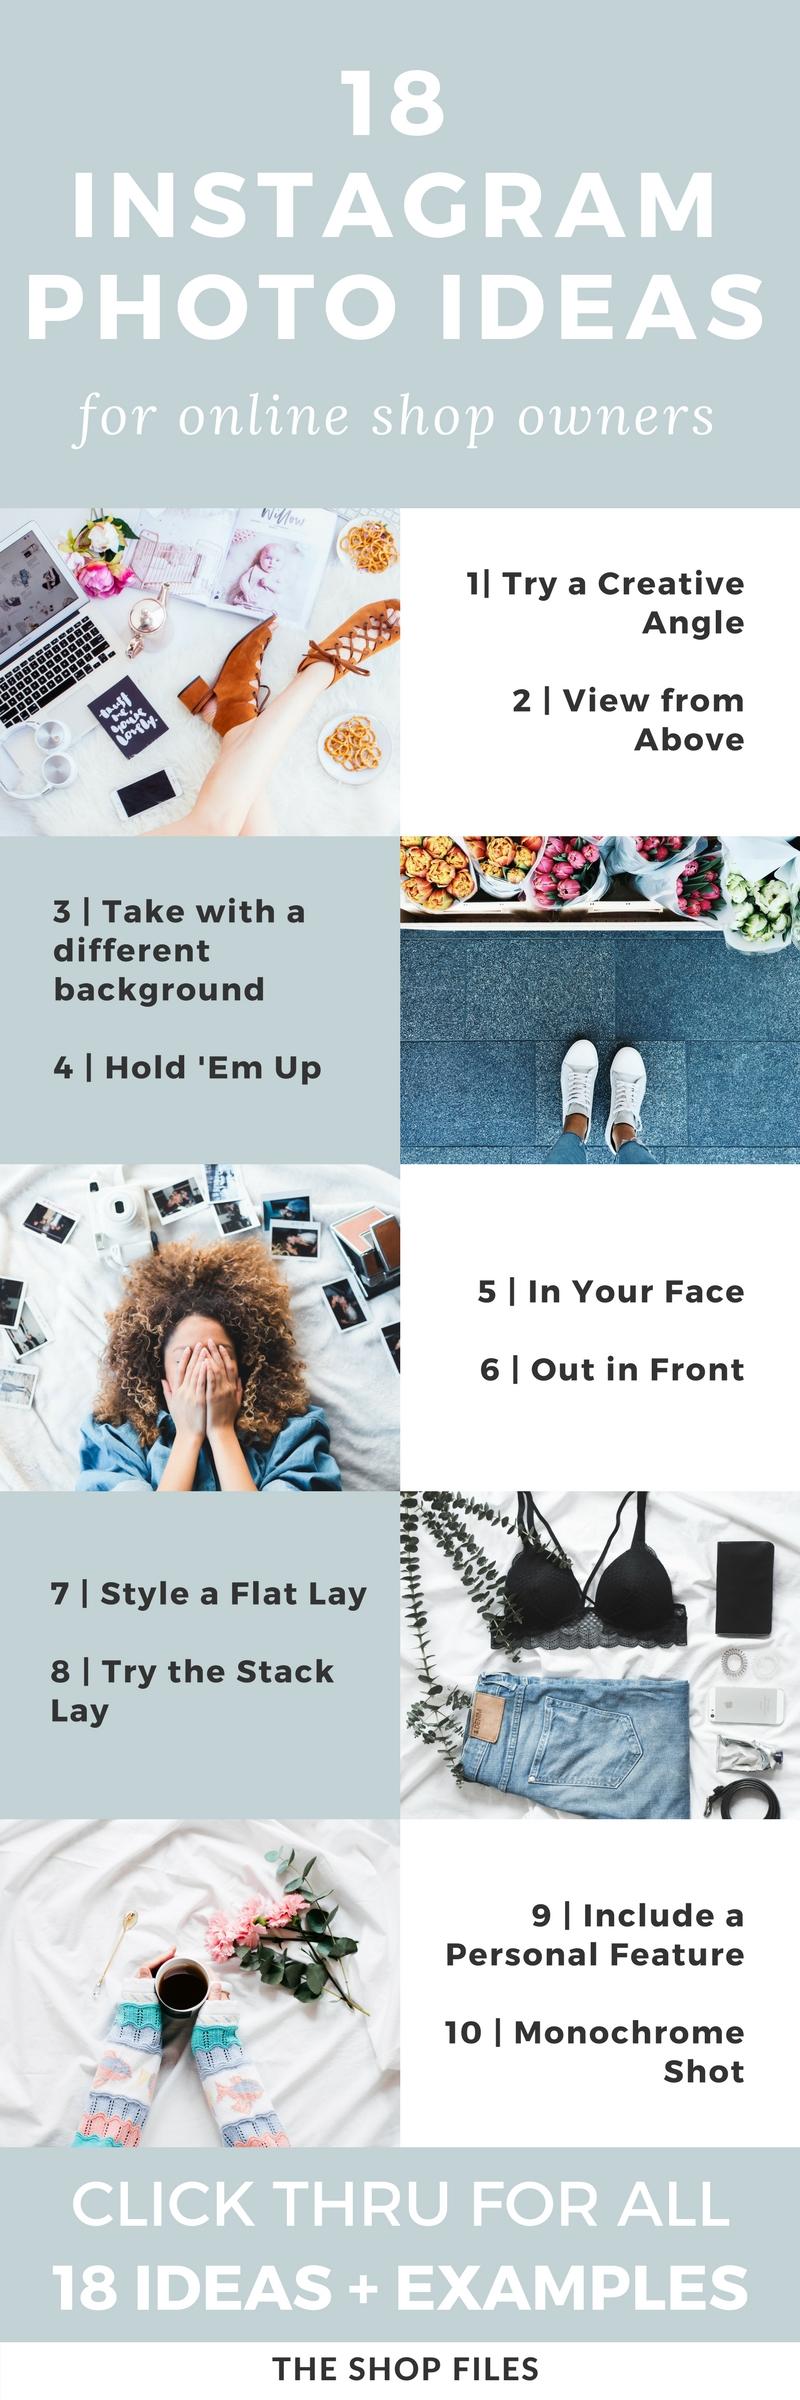 Instagram Photo Ideas for Online Shops   The Shop Files